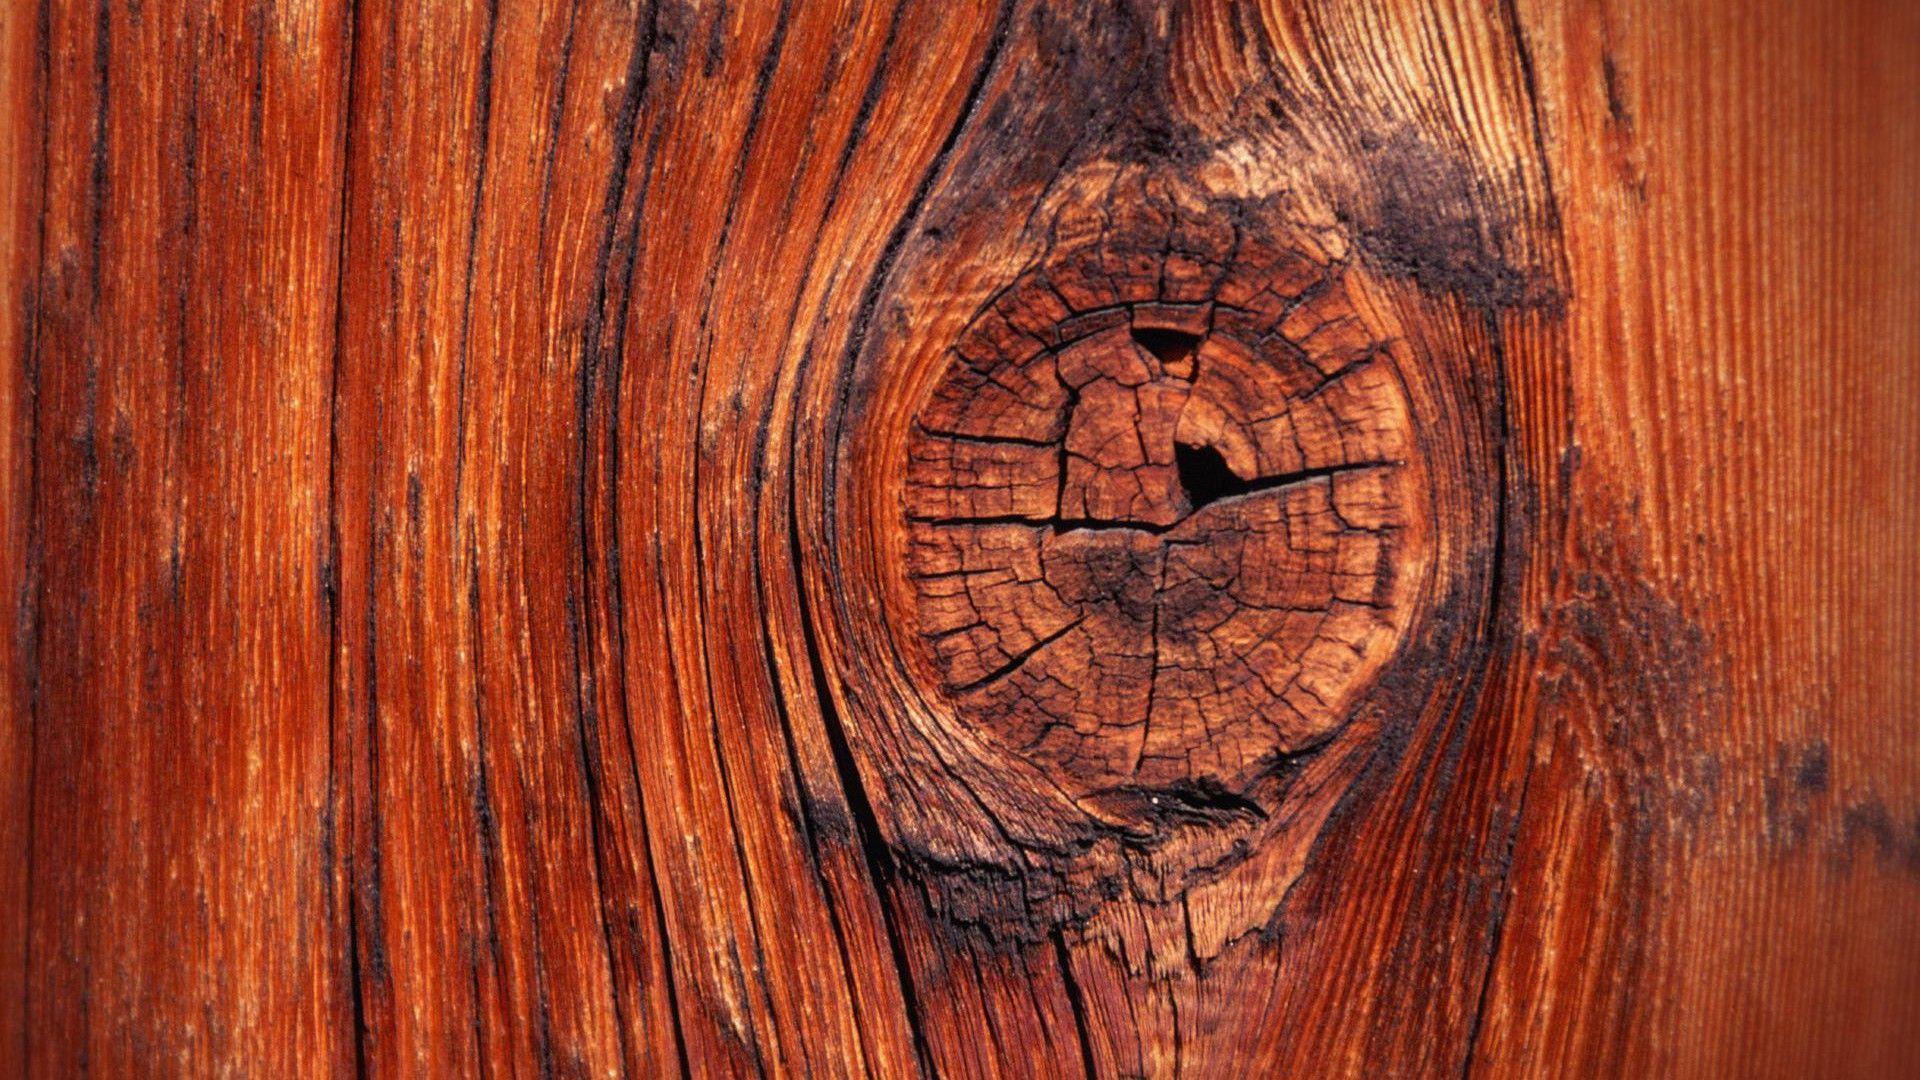 Hd wallpaper wood - Hd Wood Backgrounds Wallpaper